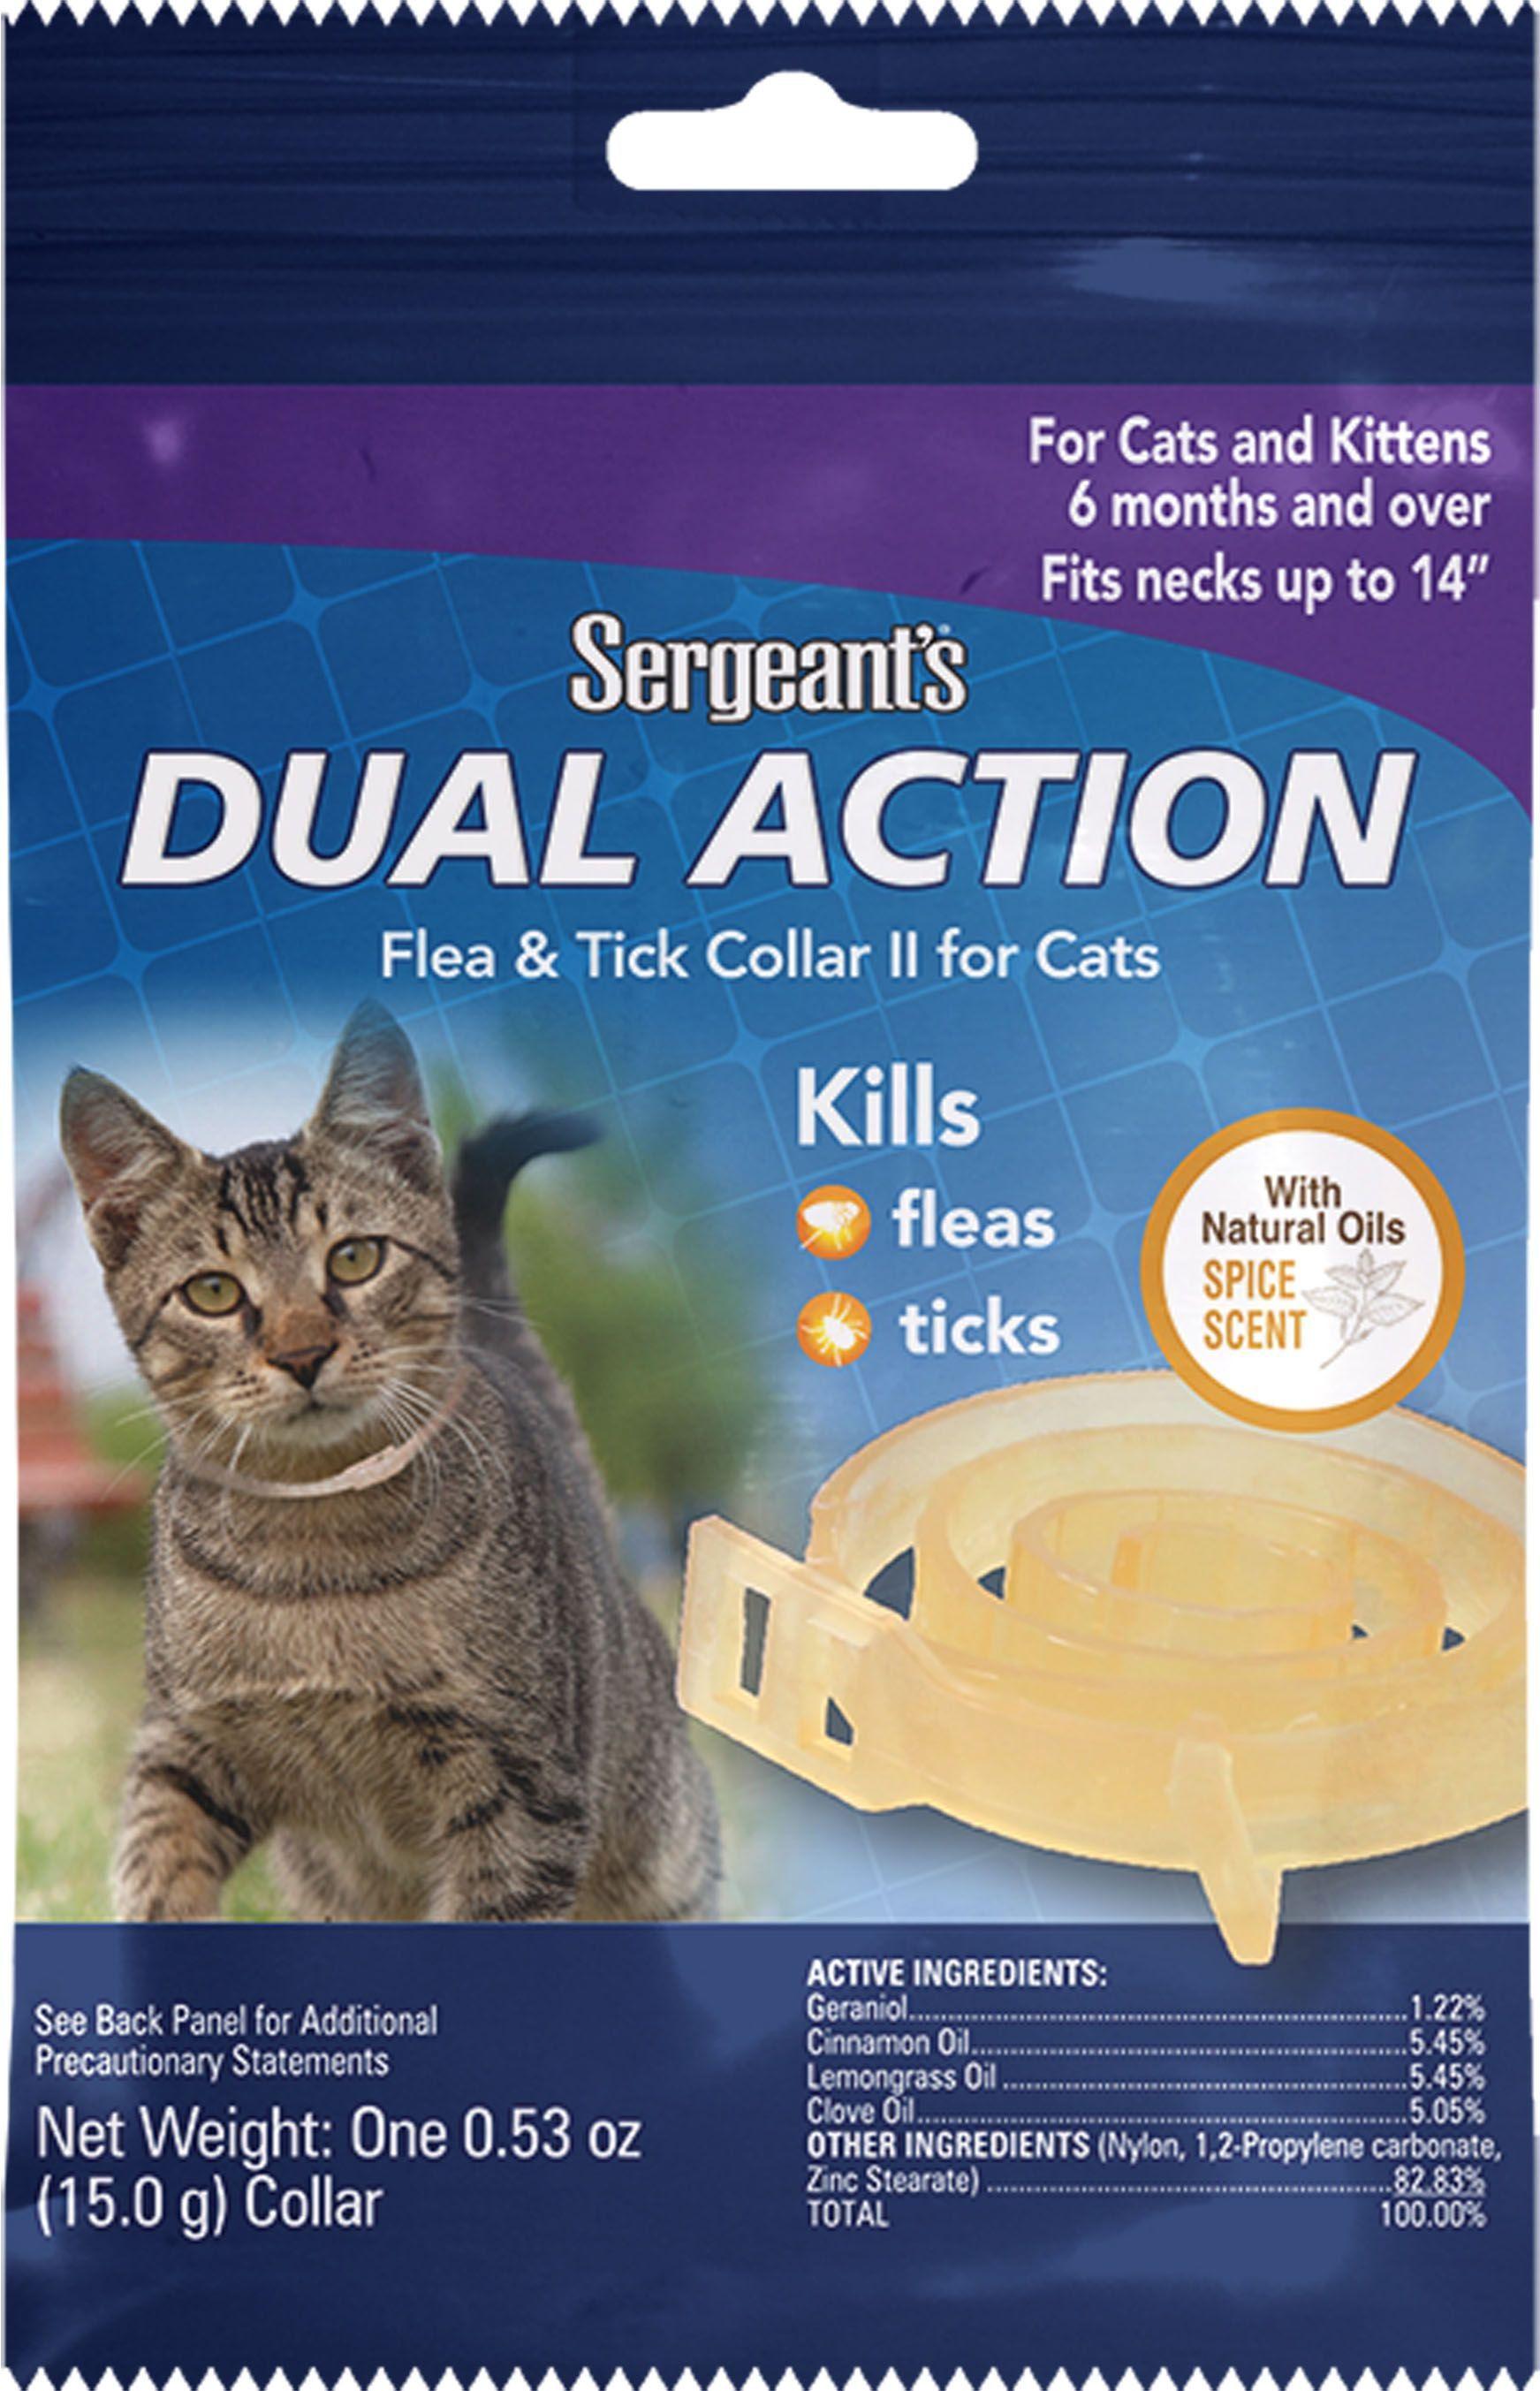 Cats Sergeants Dual Action Flea Tick Collar For Cats By Sergeants Pet Care Pro Cats Sergeants Dual Action Flea In 2020 Flea And Tick Cats And Kittens Fleas